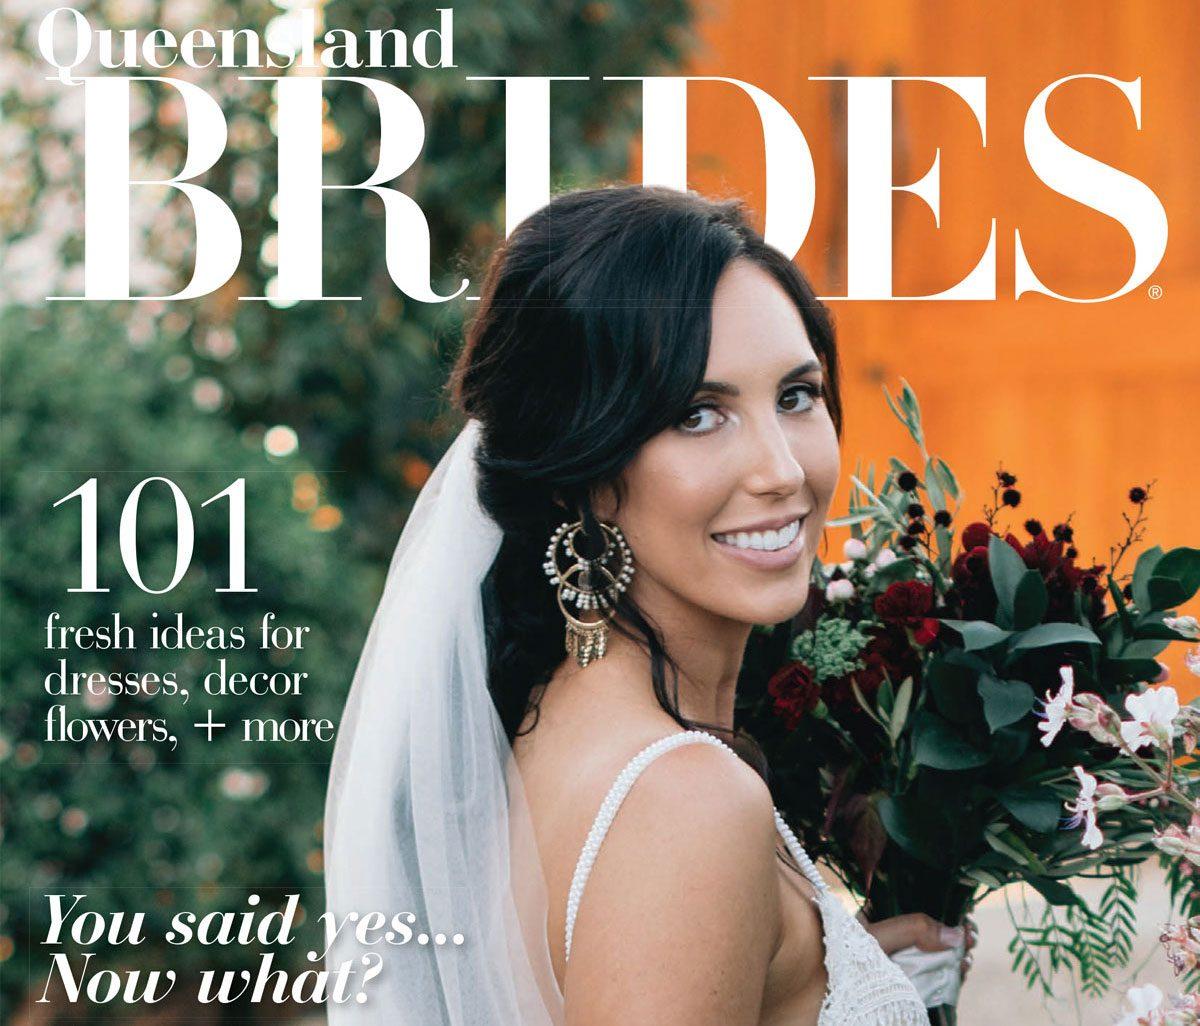 Queensland Brides Spring Summer 2019 edition